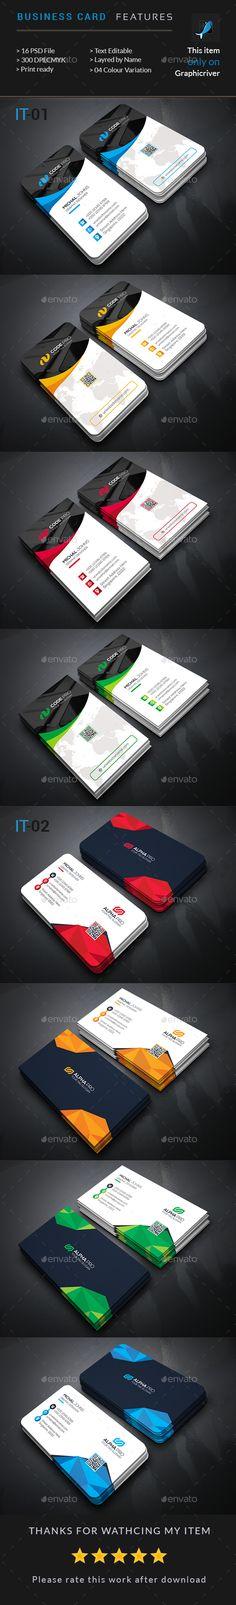 Soft Card Card Bundle - Business Cards Print Templates Download here : https://graphicriver.net/item/soft-card-card-bundle/18933758?s_rank=116&ref=Al-fatih